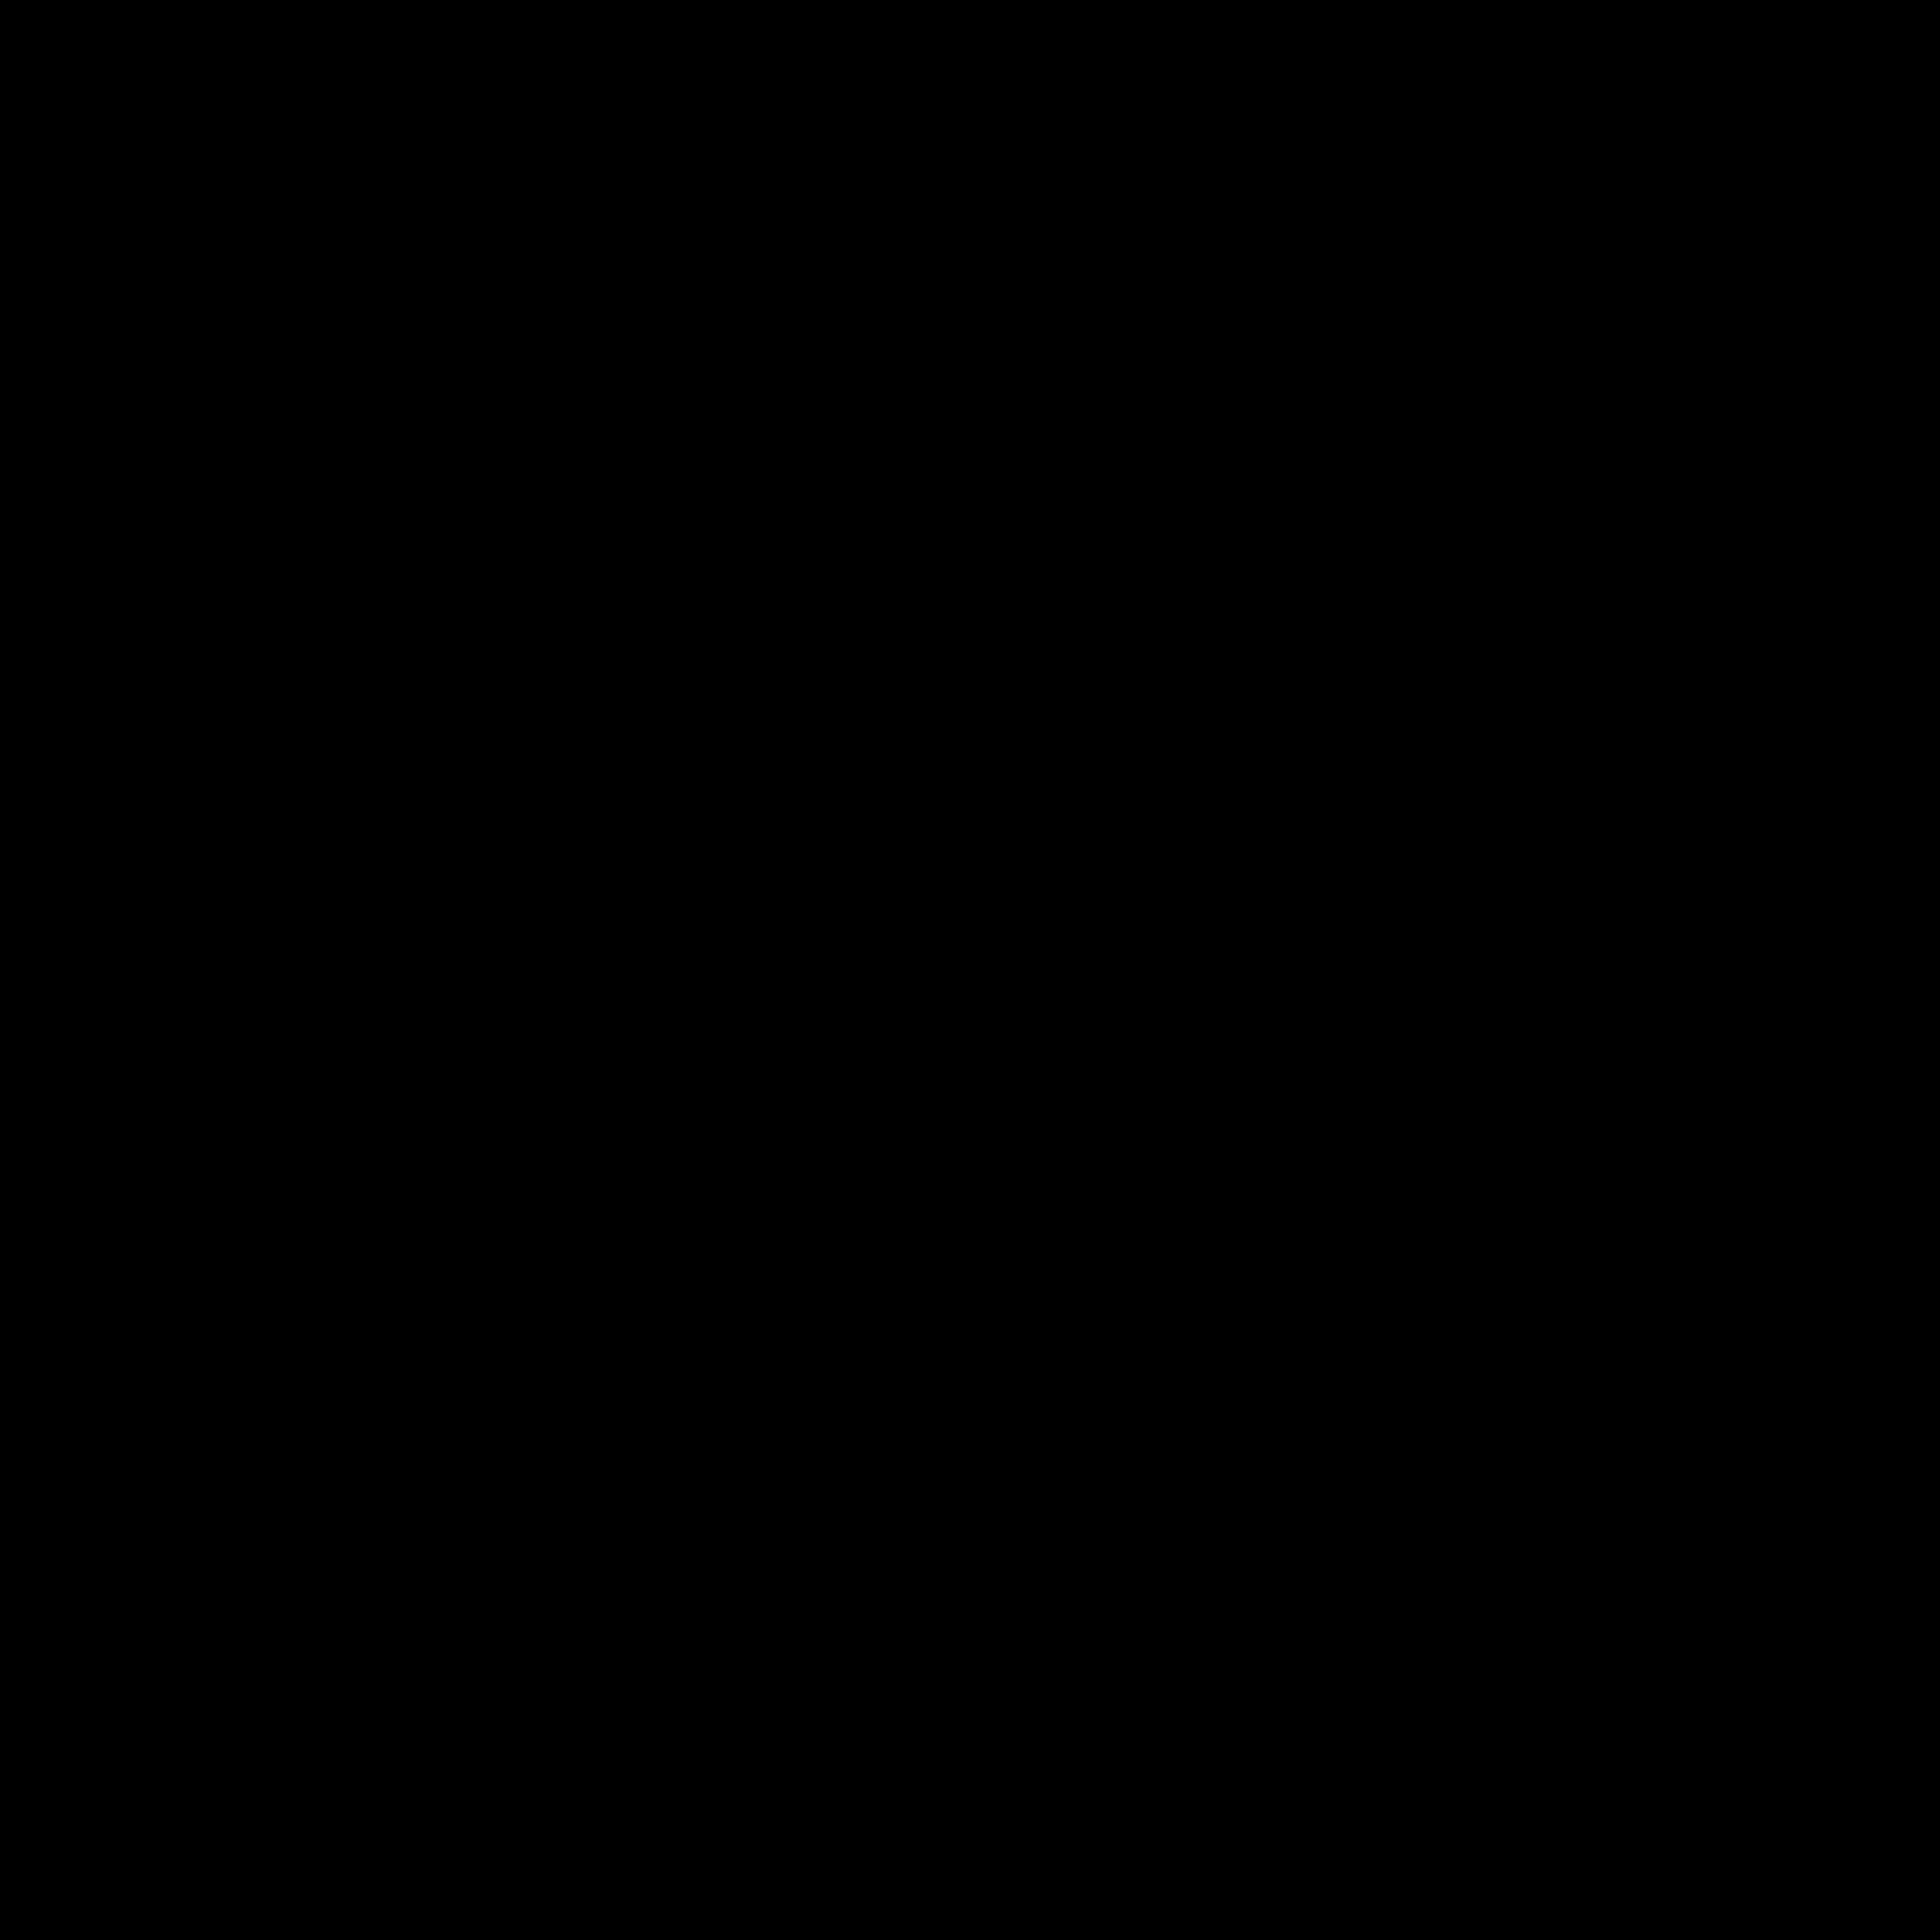 Celtic heart knot clipart vector stock Clipart - Celtic Knot Frame 6 vector stock